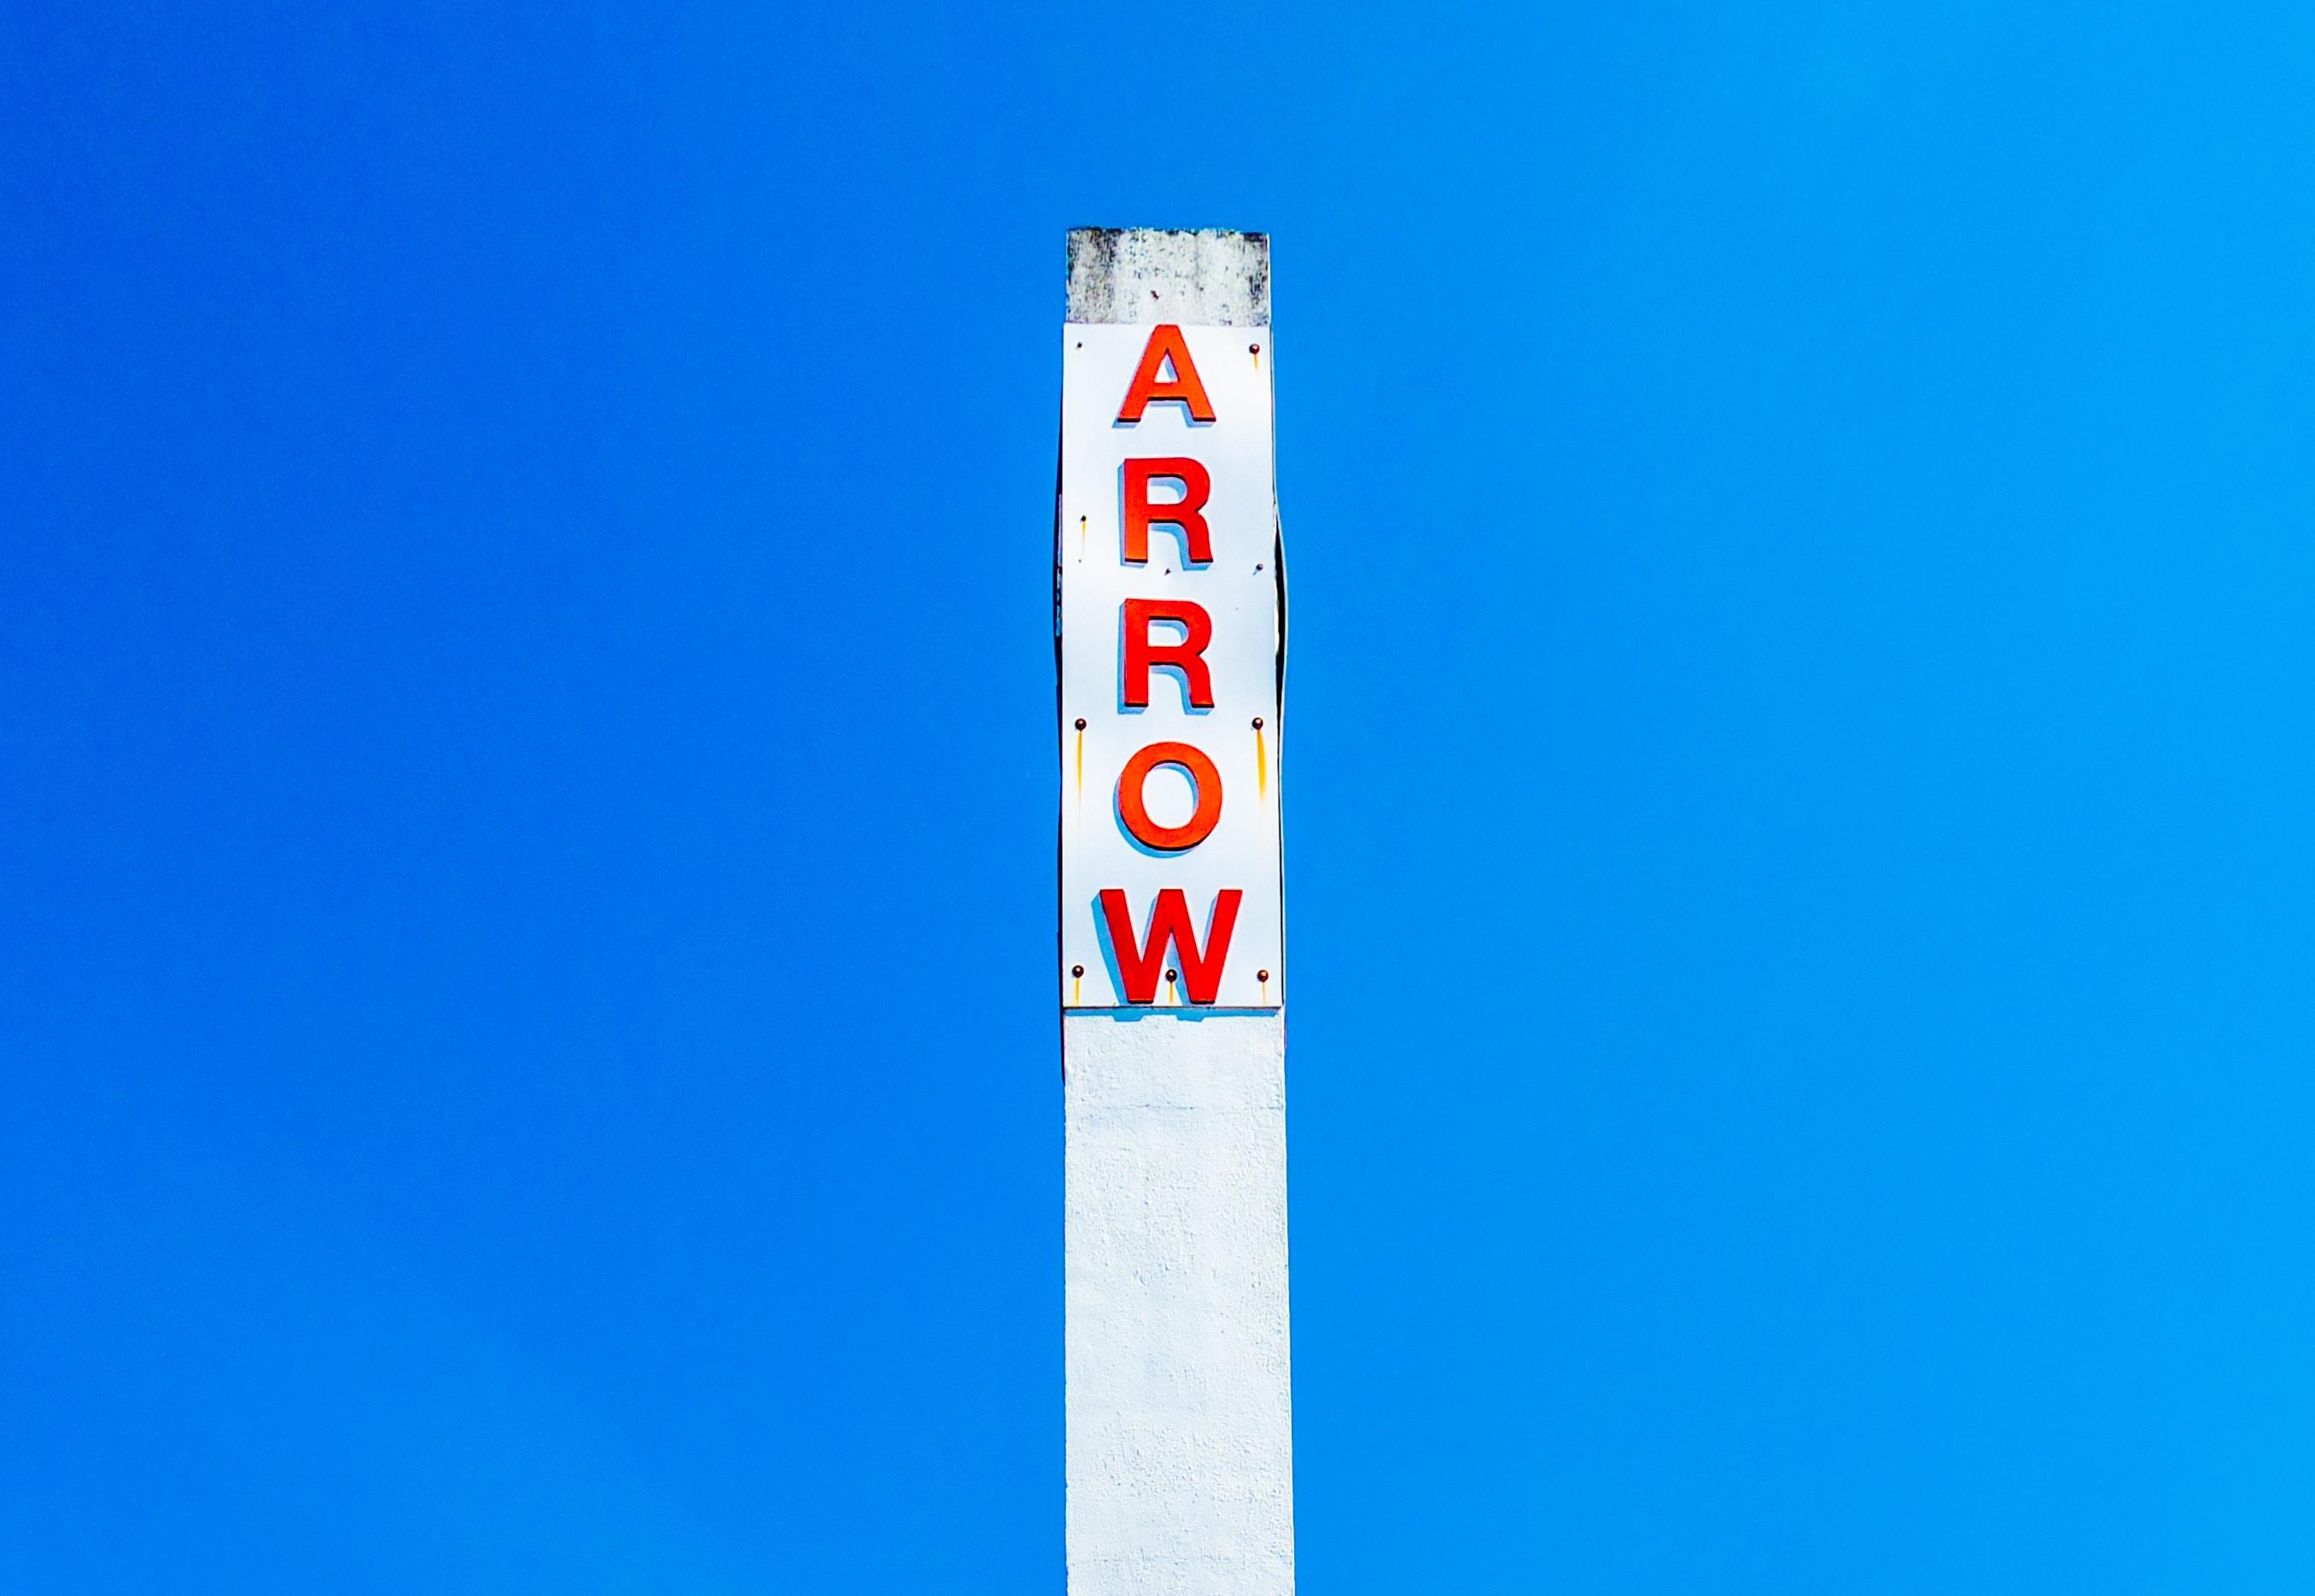 Arrow signage under blue sky